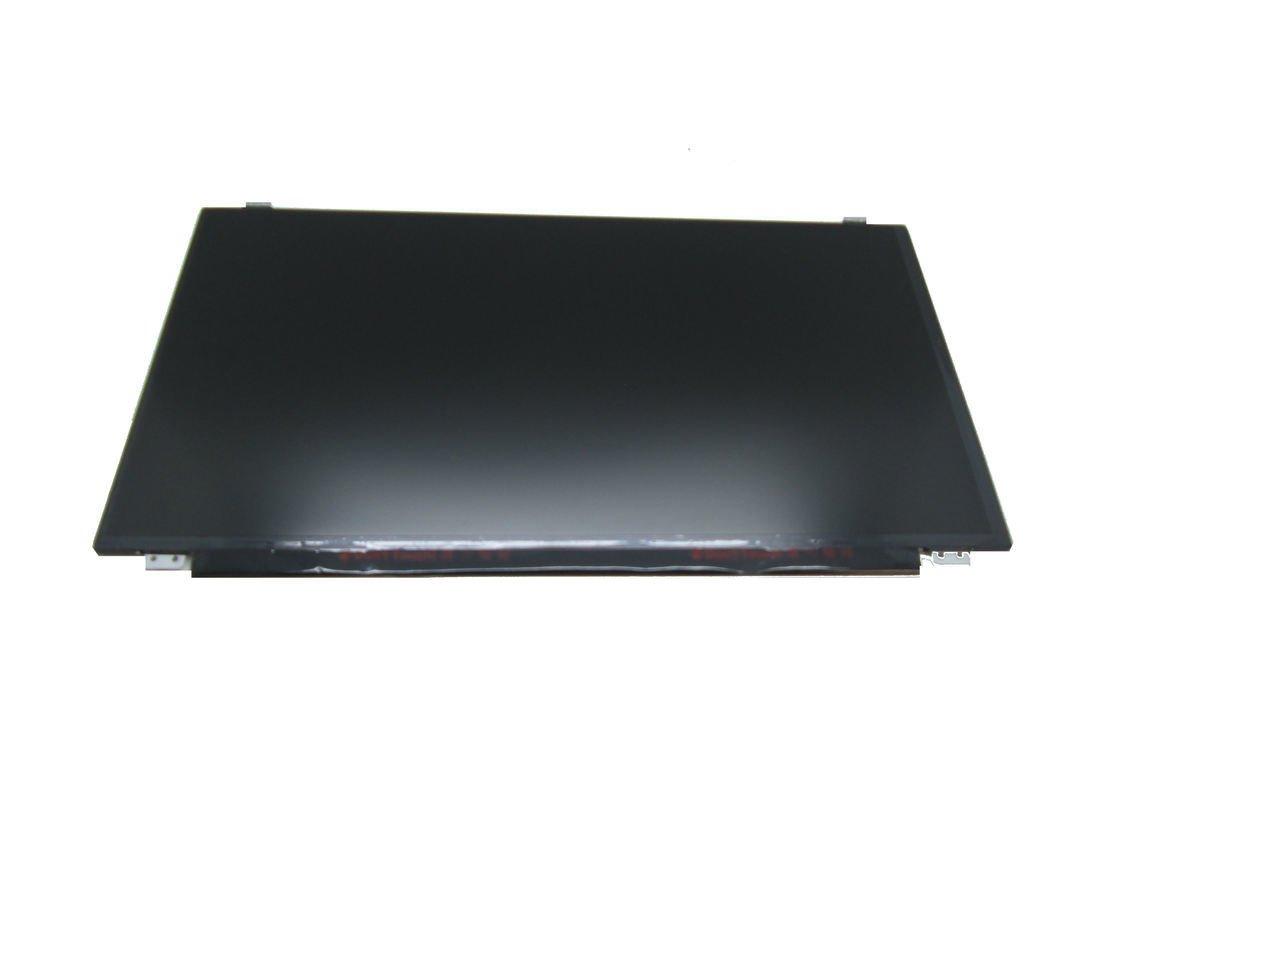 New Genuine Lenovo Thinkpad P50 P50S L560 15.6 Non-touch serise 15.6 FHD 1920 x 1080 IPS LCD Screen 00HT921